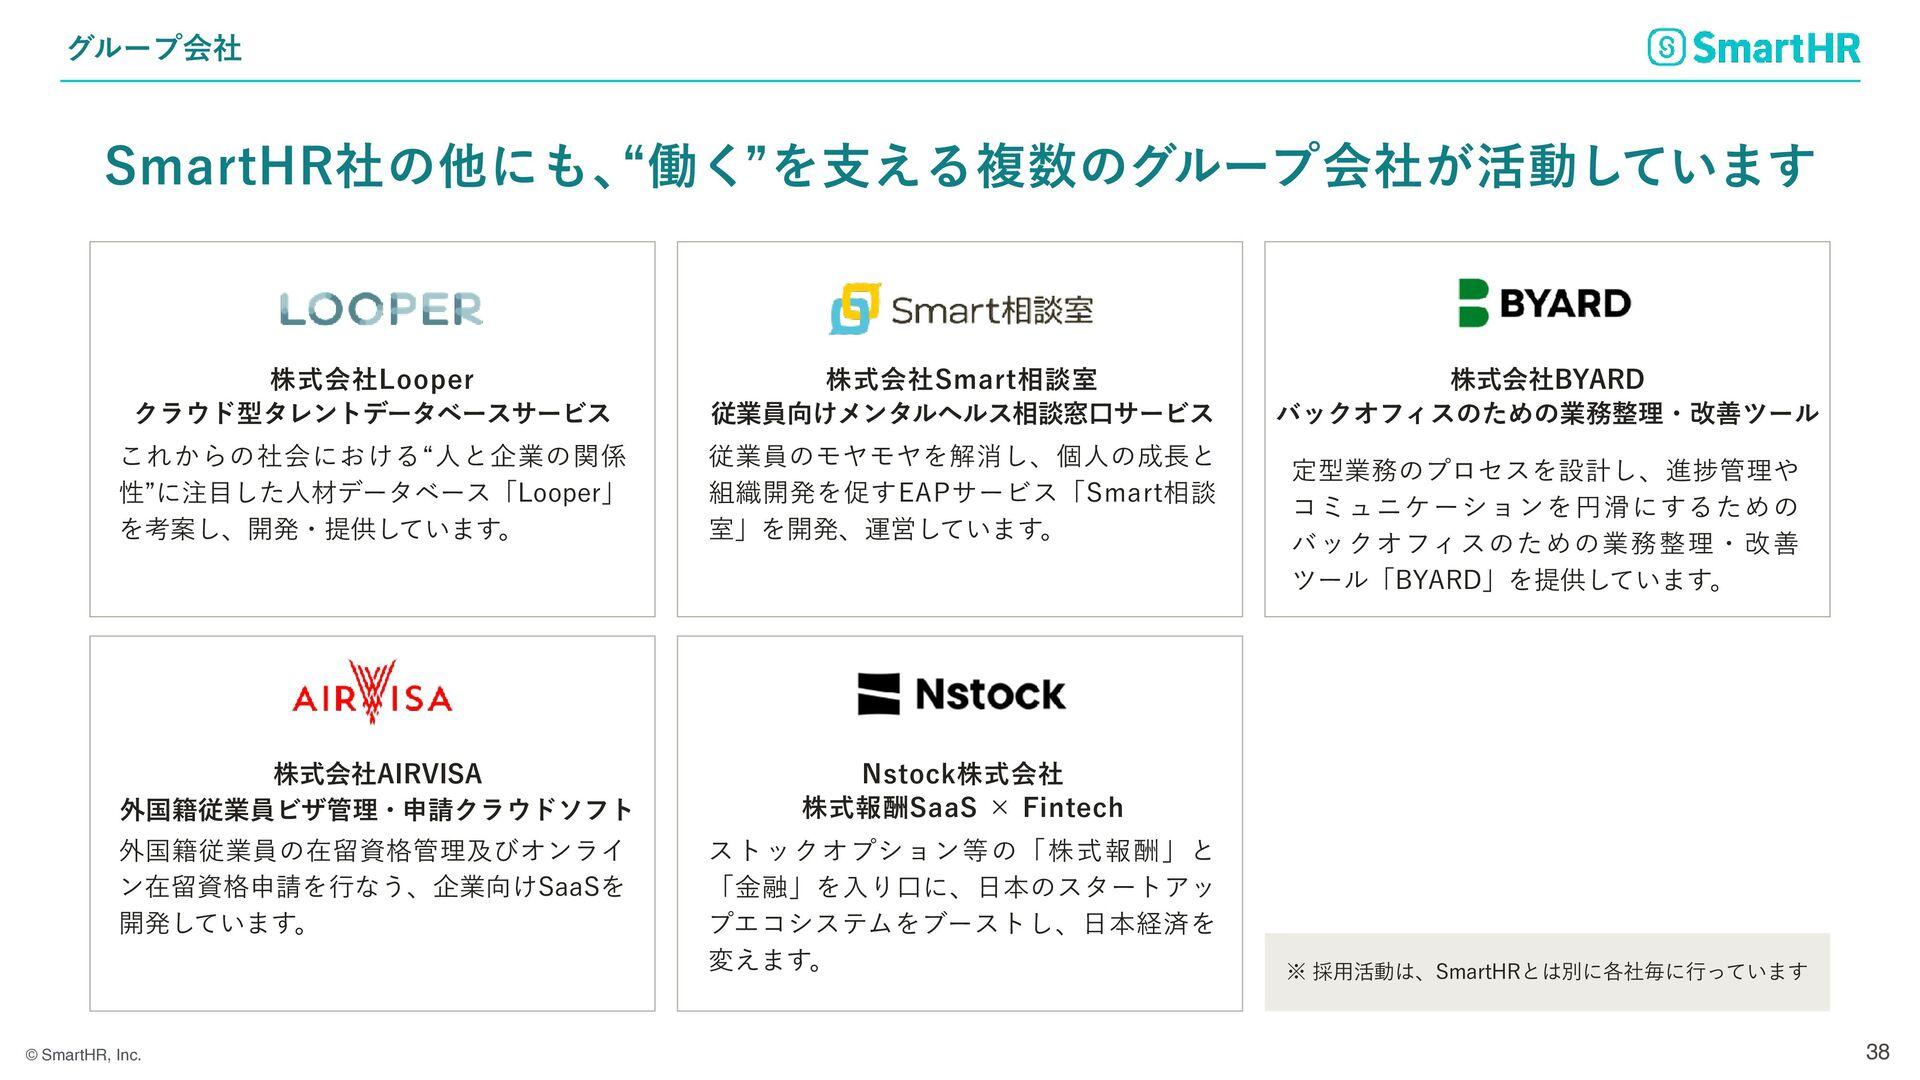 άϧʔϓձࣾʹ͍ͭͯ 4NBSU)3ࣾҎ֎ʹɺͭͷάϧʔϓձ͕ࣾ׆ಈ͍ͯ͠·͢ ͜Ε͔Βͷࣾ...